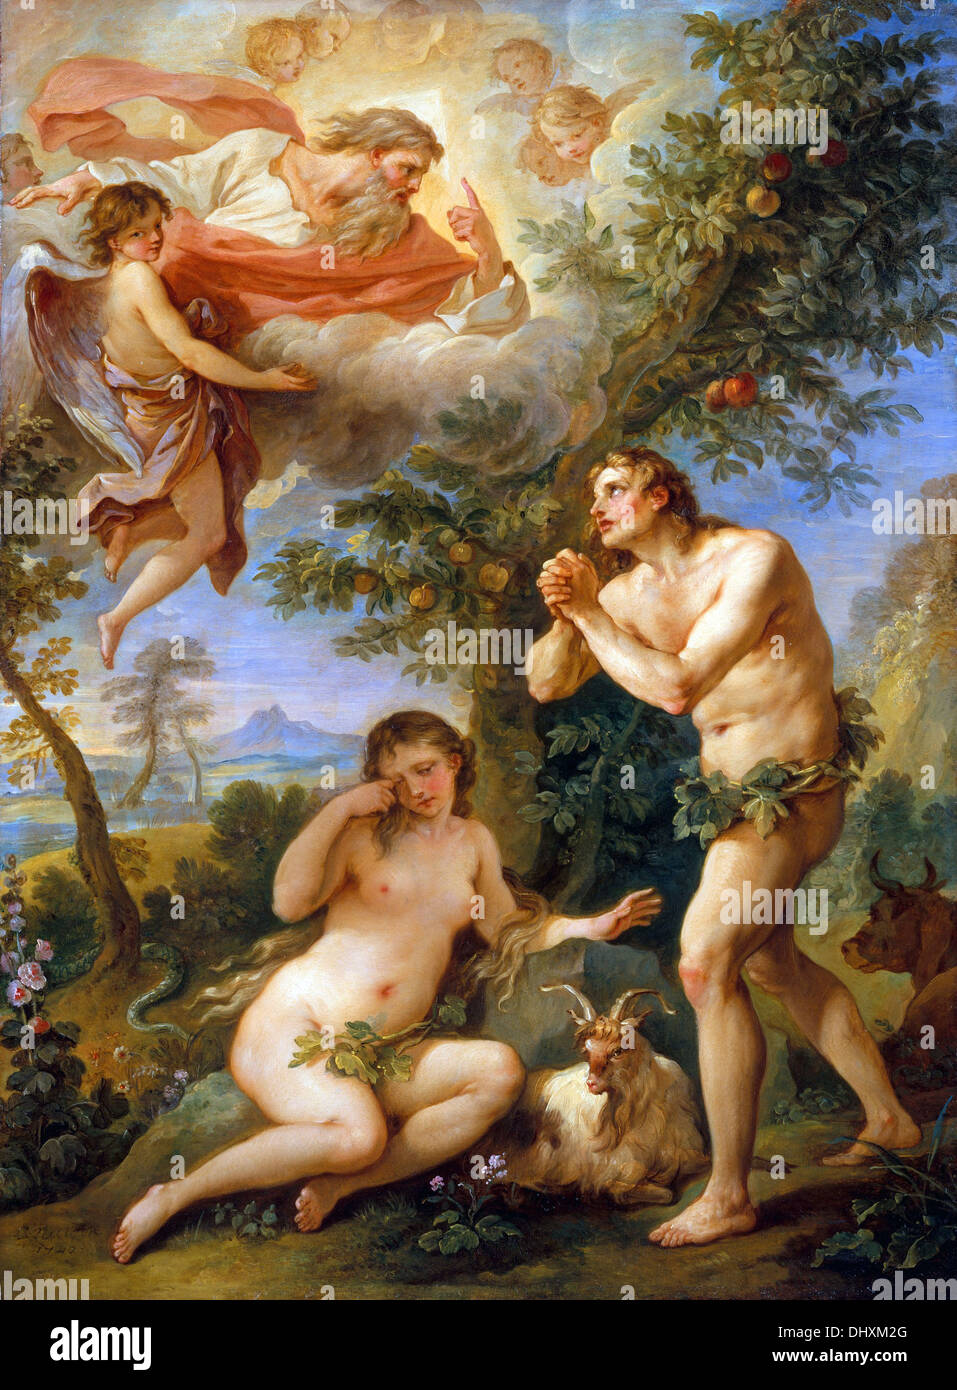 The Expulsion from Paradise - by Charles Joseph Natoire, 1740 - Stock Image